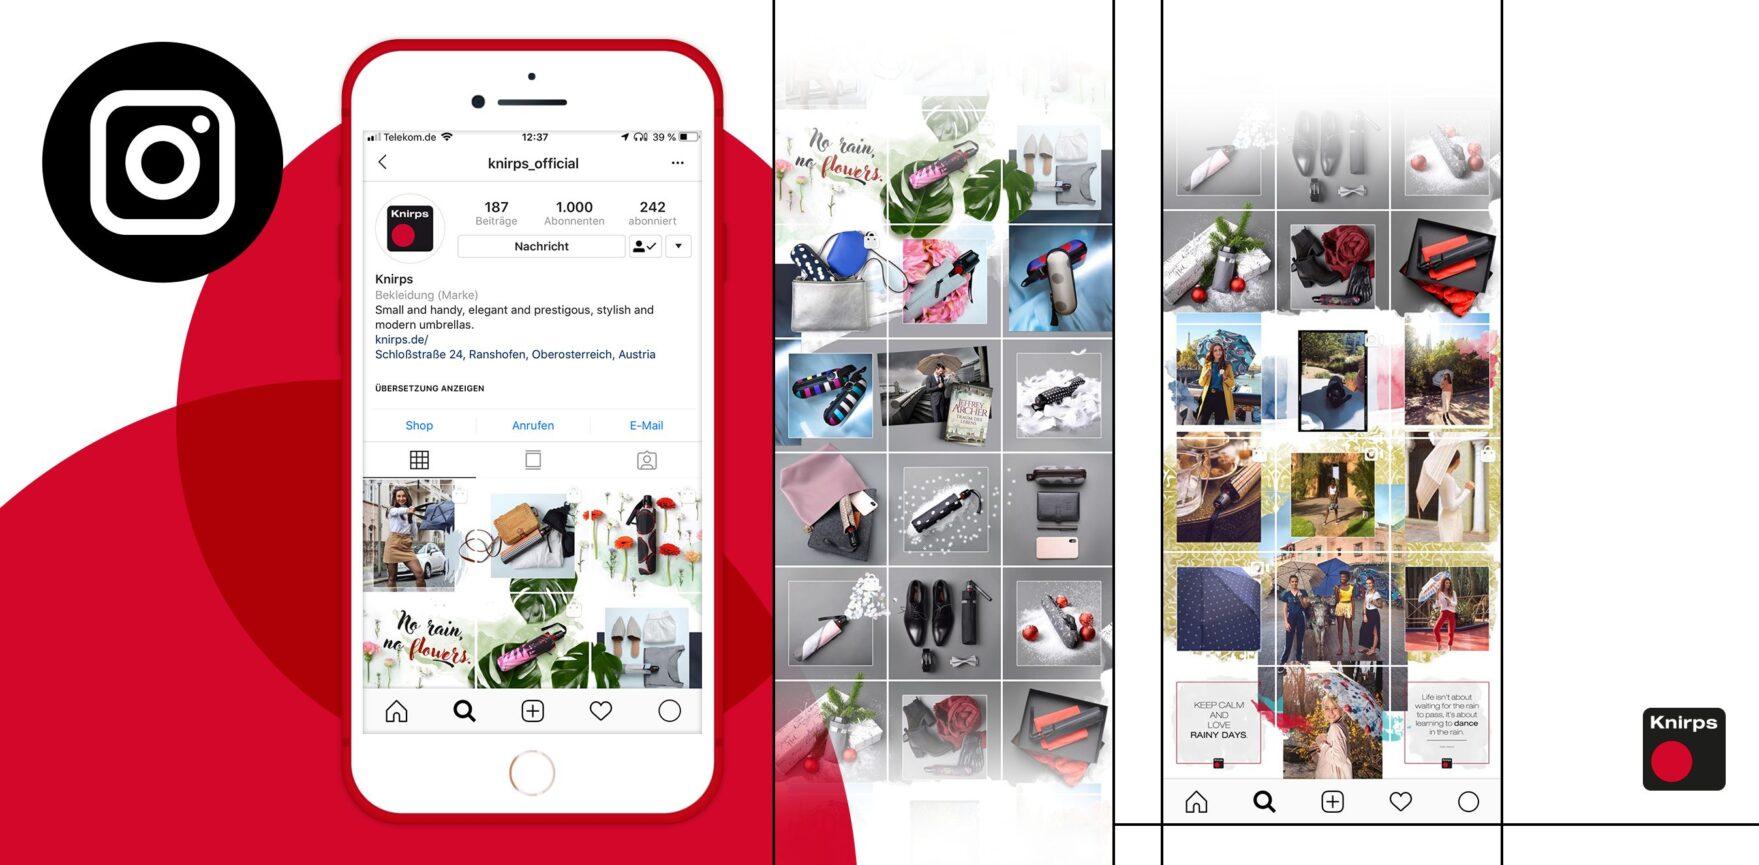 Facebook Post Knirps Seamless Grid Instagram Feed